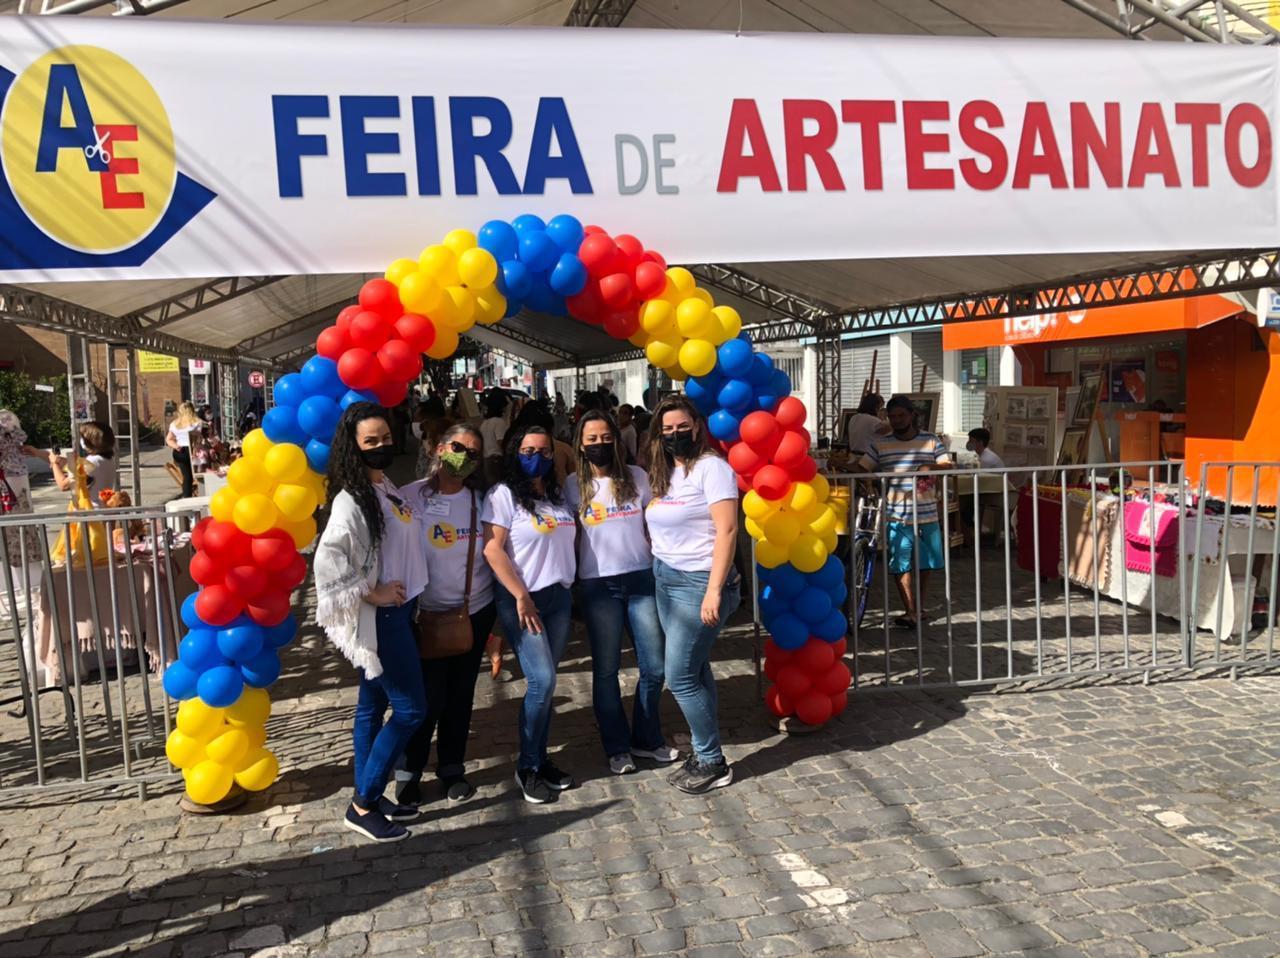 Feira de Artesanato supera expectativa de vendas no município de Eunápolis 21